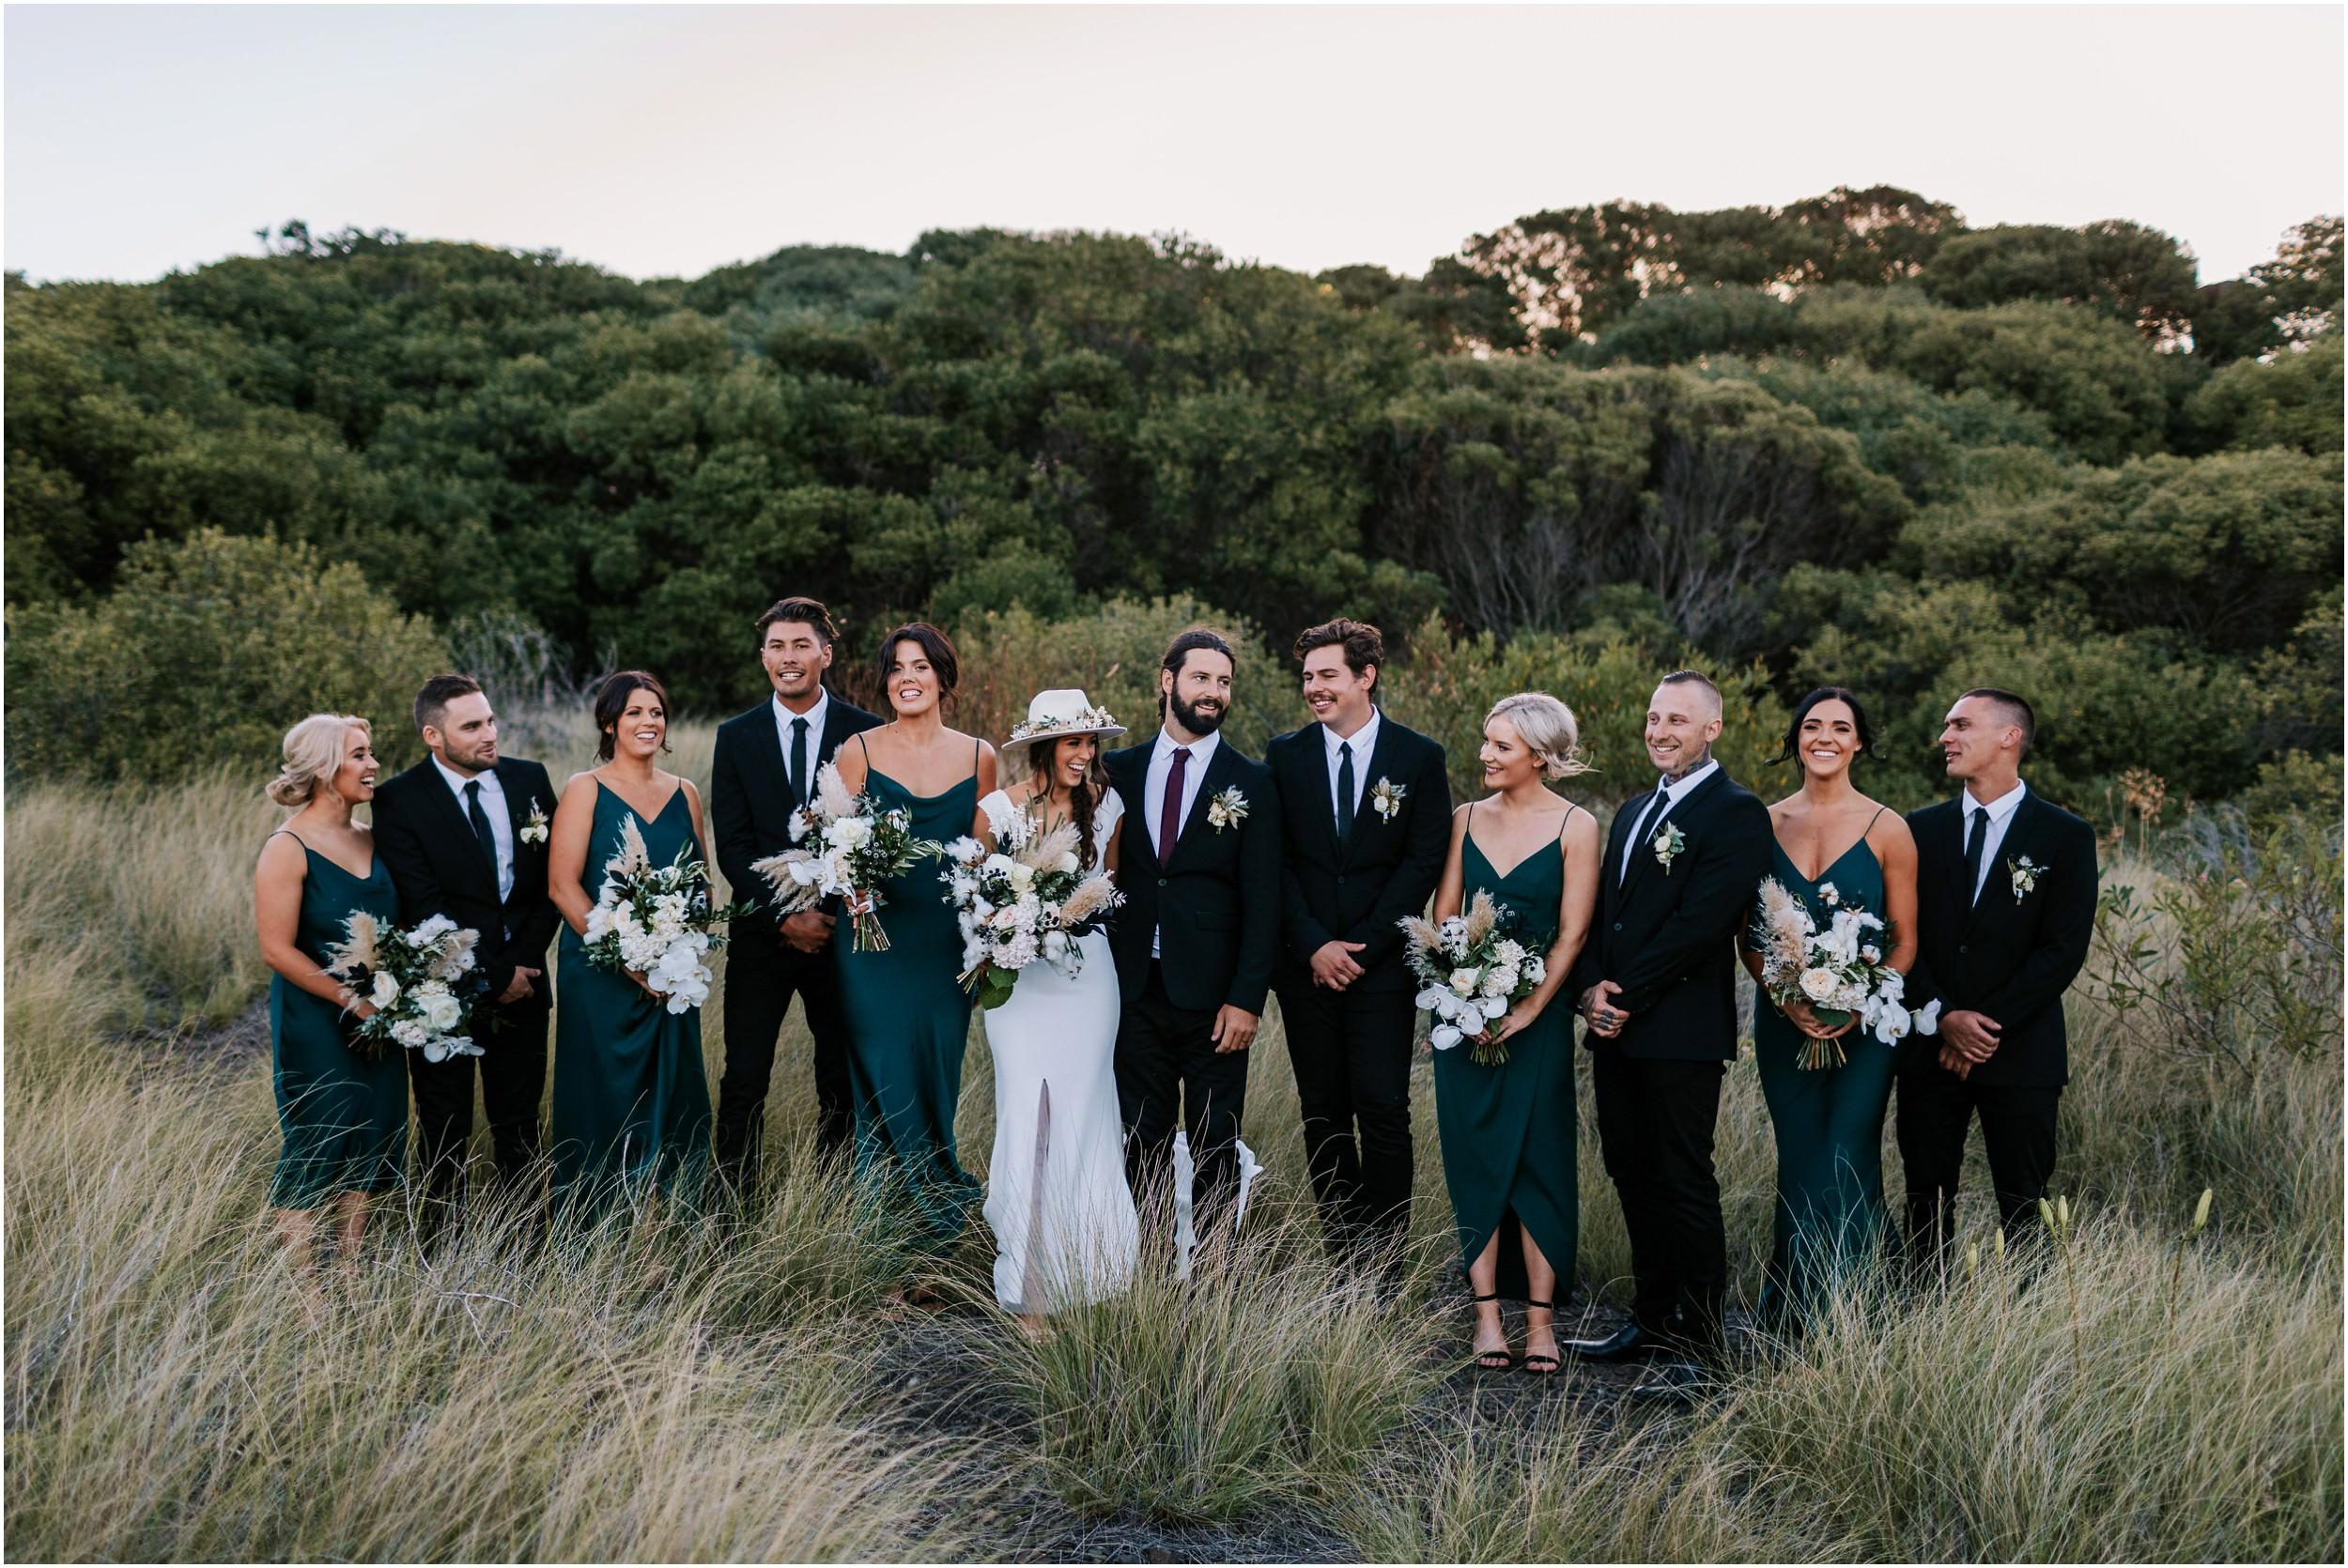 wedding_seacliff_house_alanah_keiran_0079.jpg